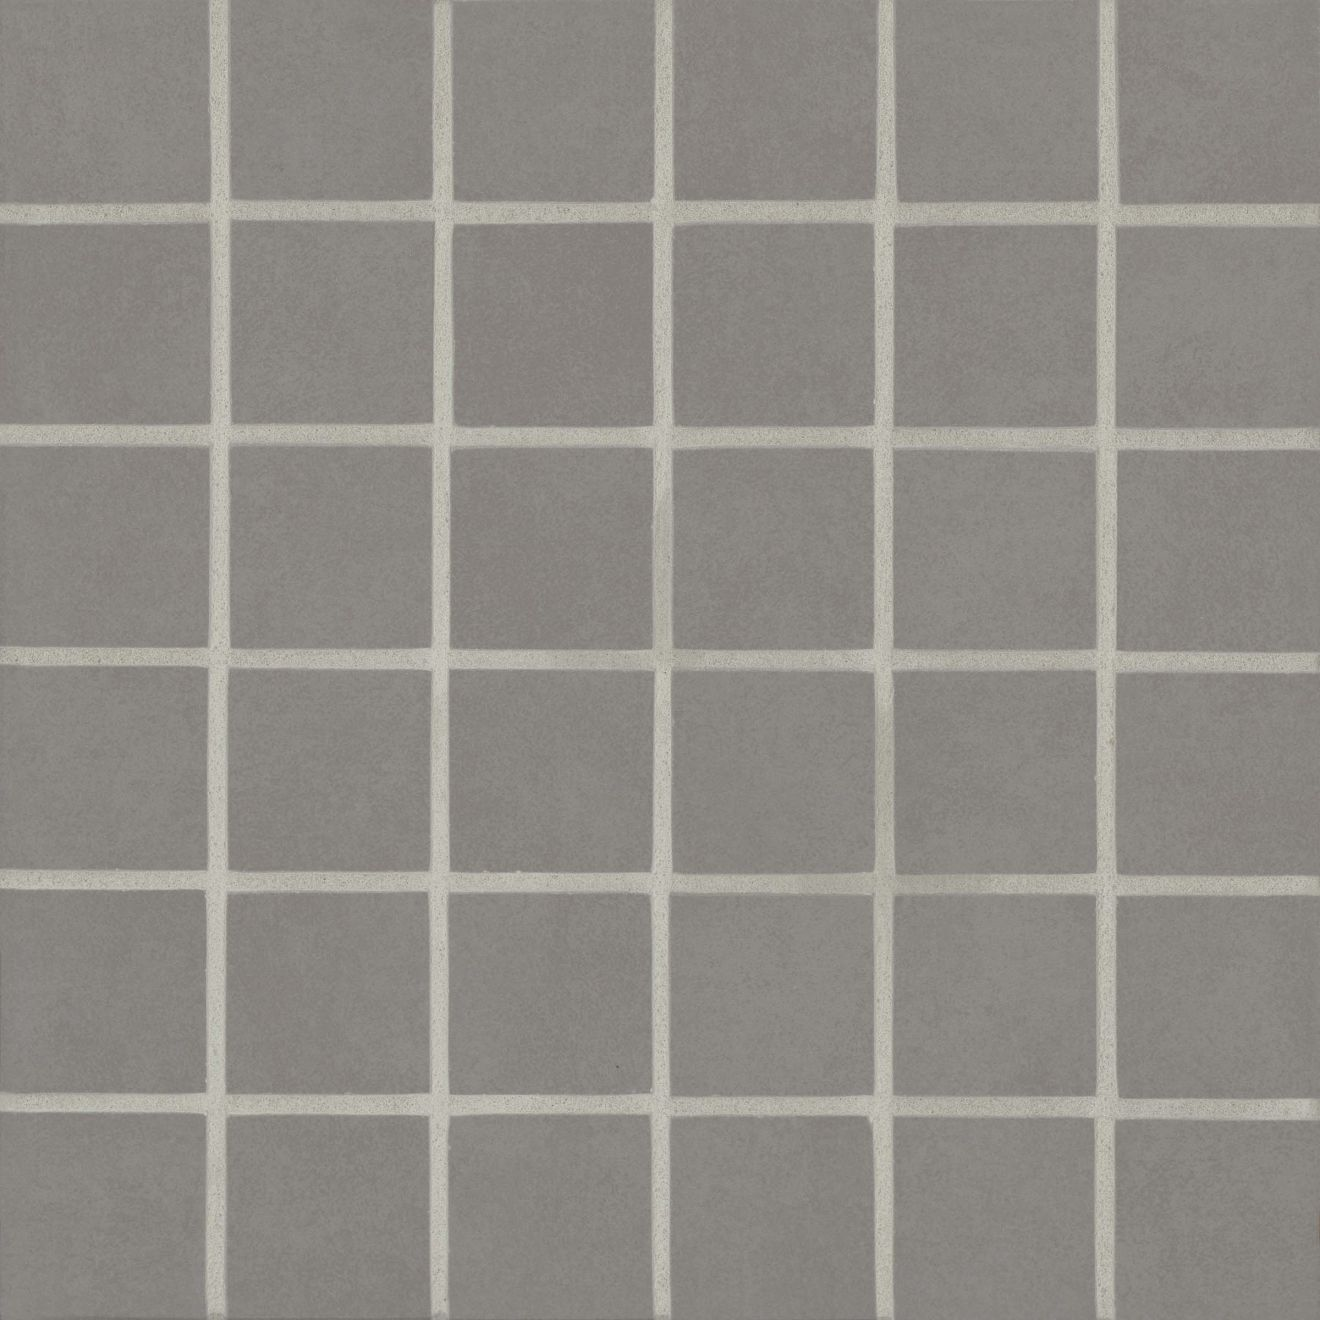 "Metro 2.0 2"" x 2"" Floor & Wall Mosaic in Greensky"